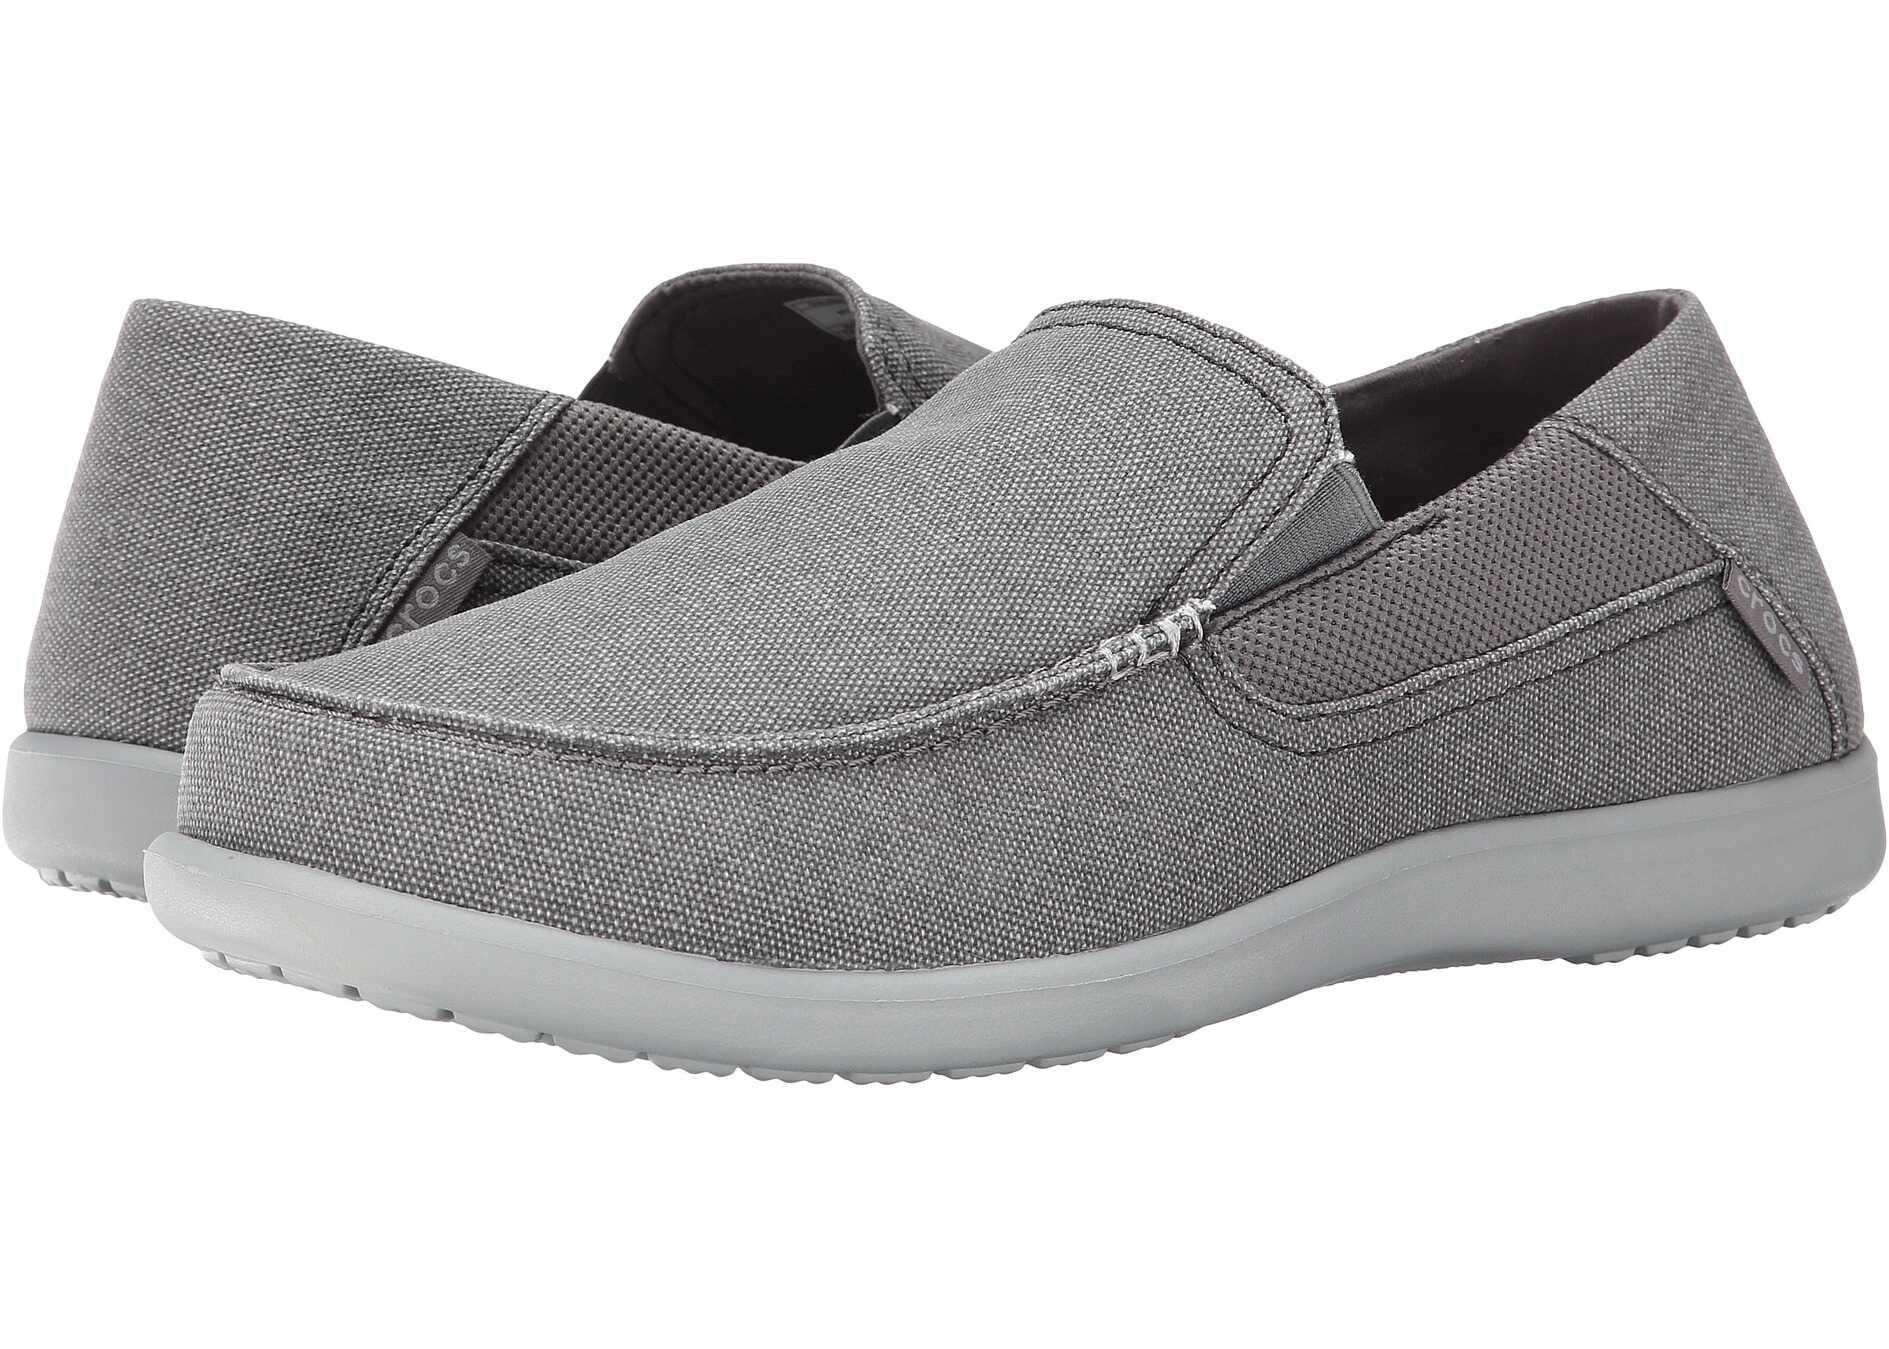 Crocs Santa Cruz 2 Luxe Charcoal/Light Grey